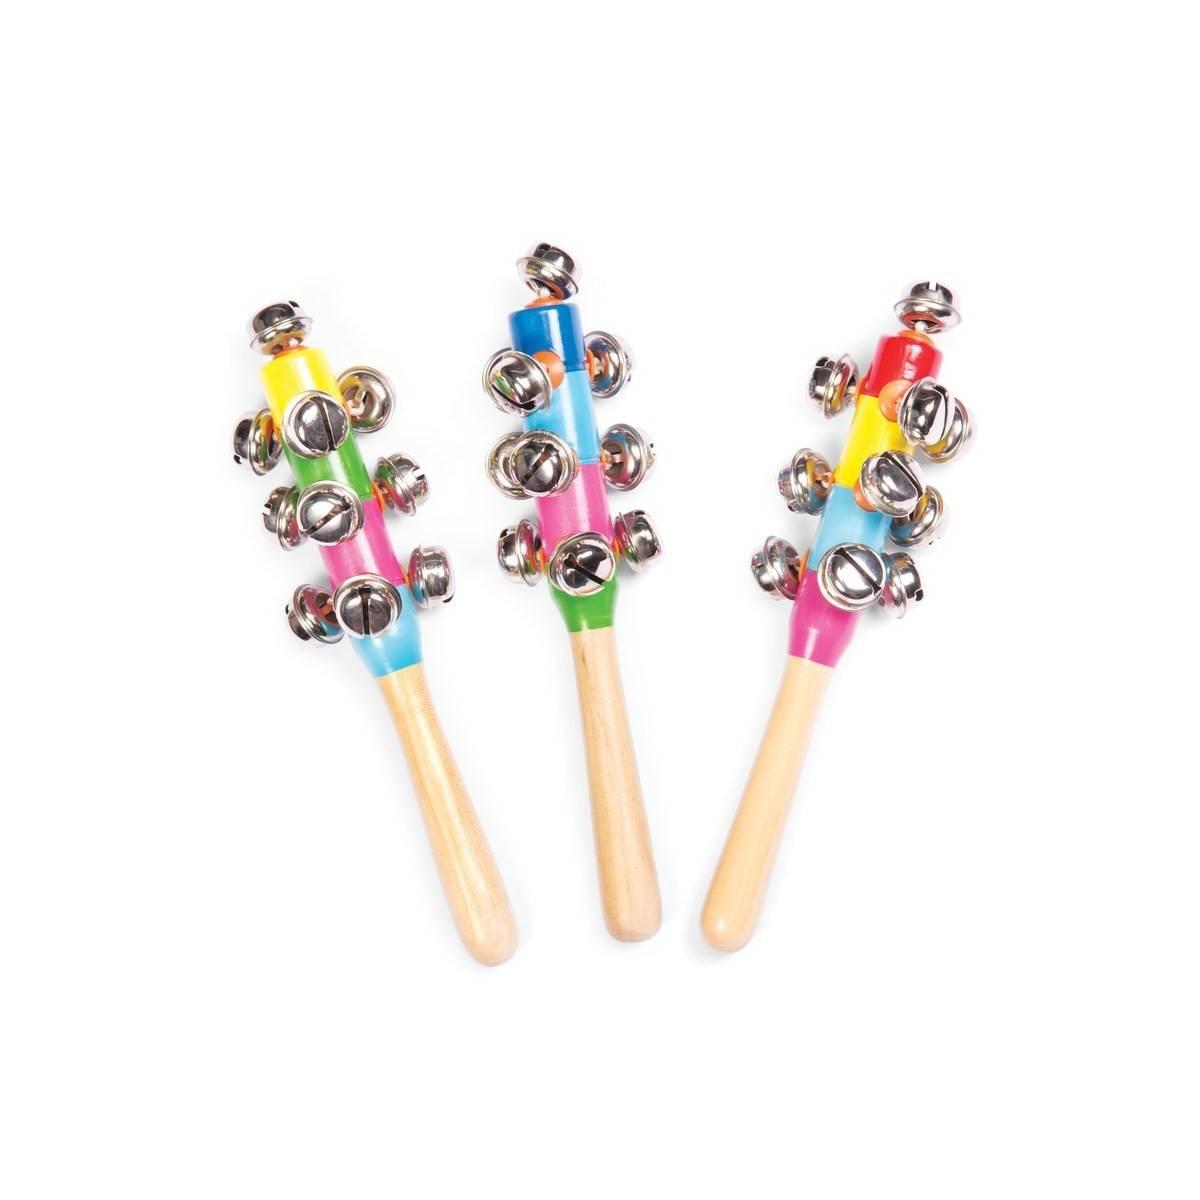 Bâton à Grelots Multicolore